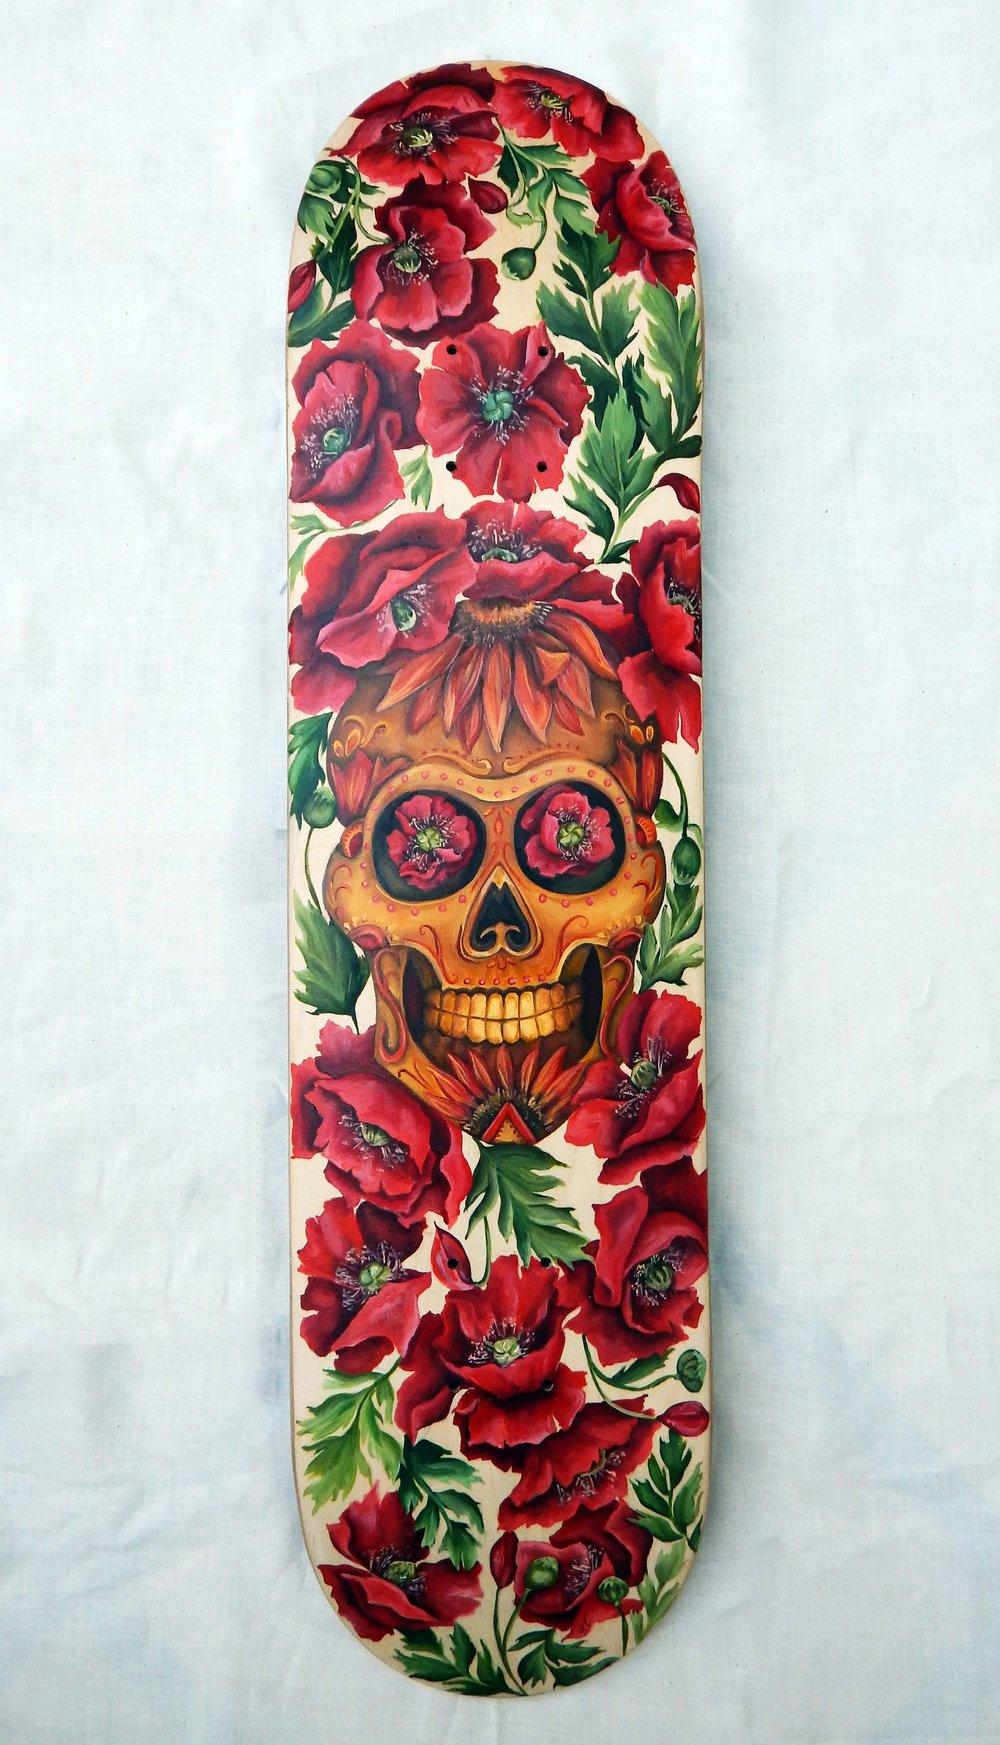 Skate Deck Commission